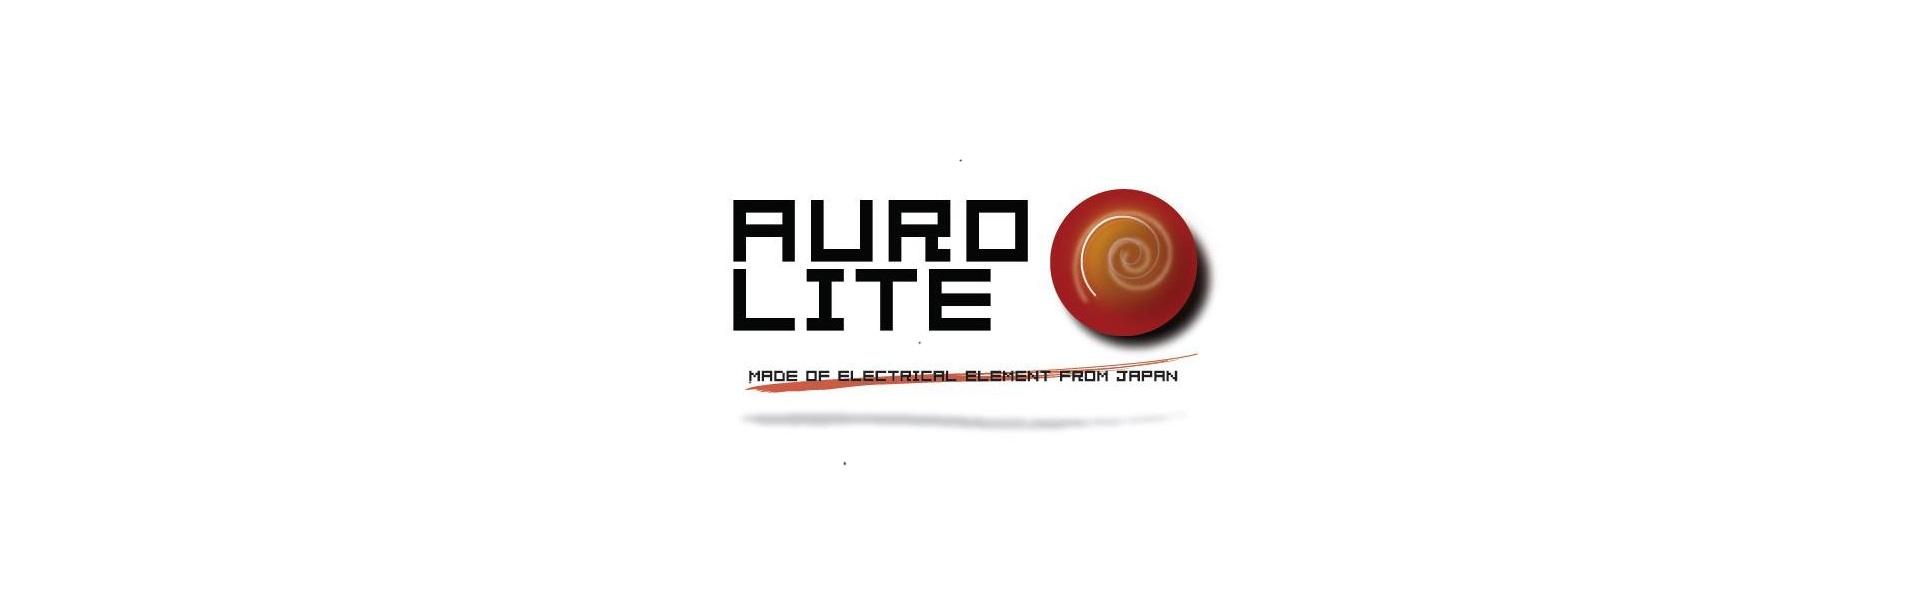 Aurolite logo